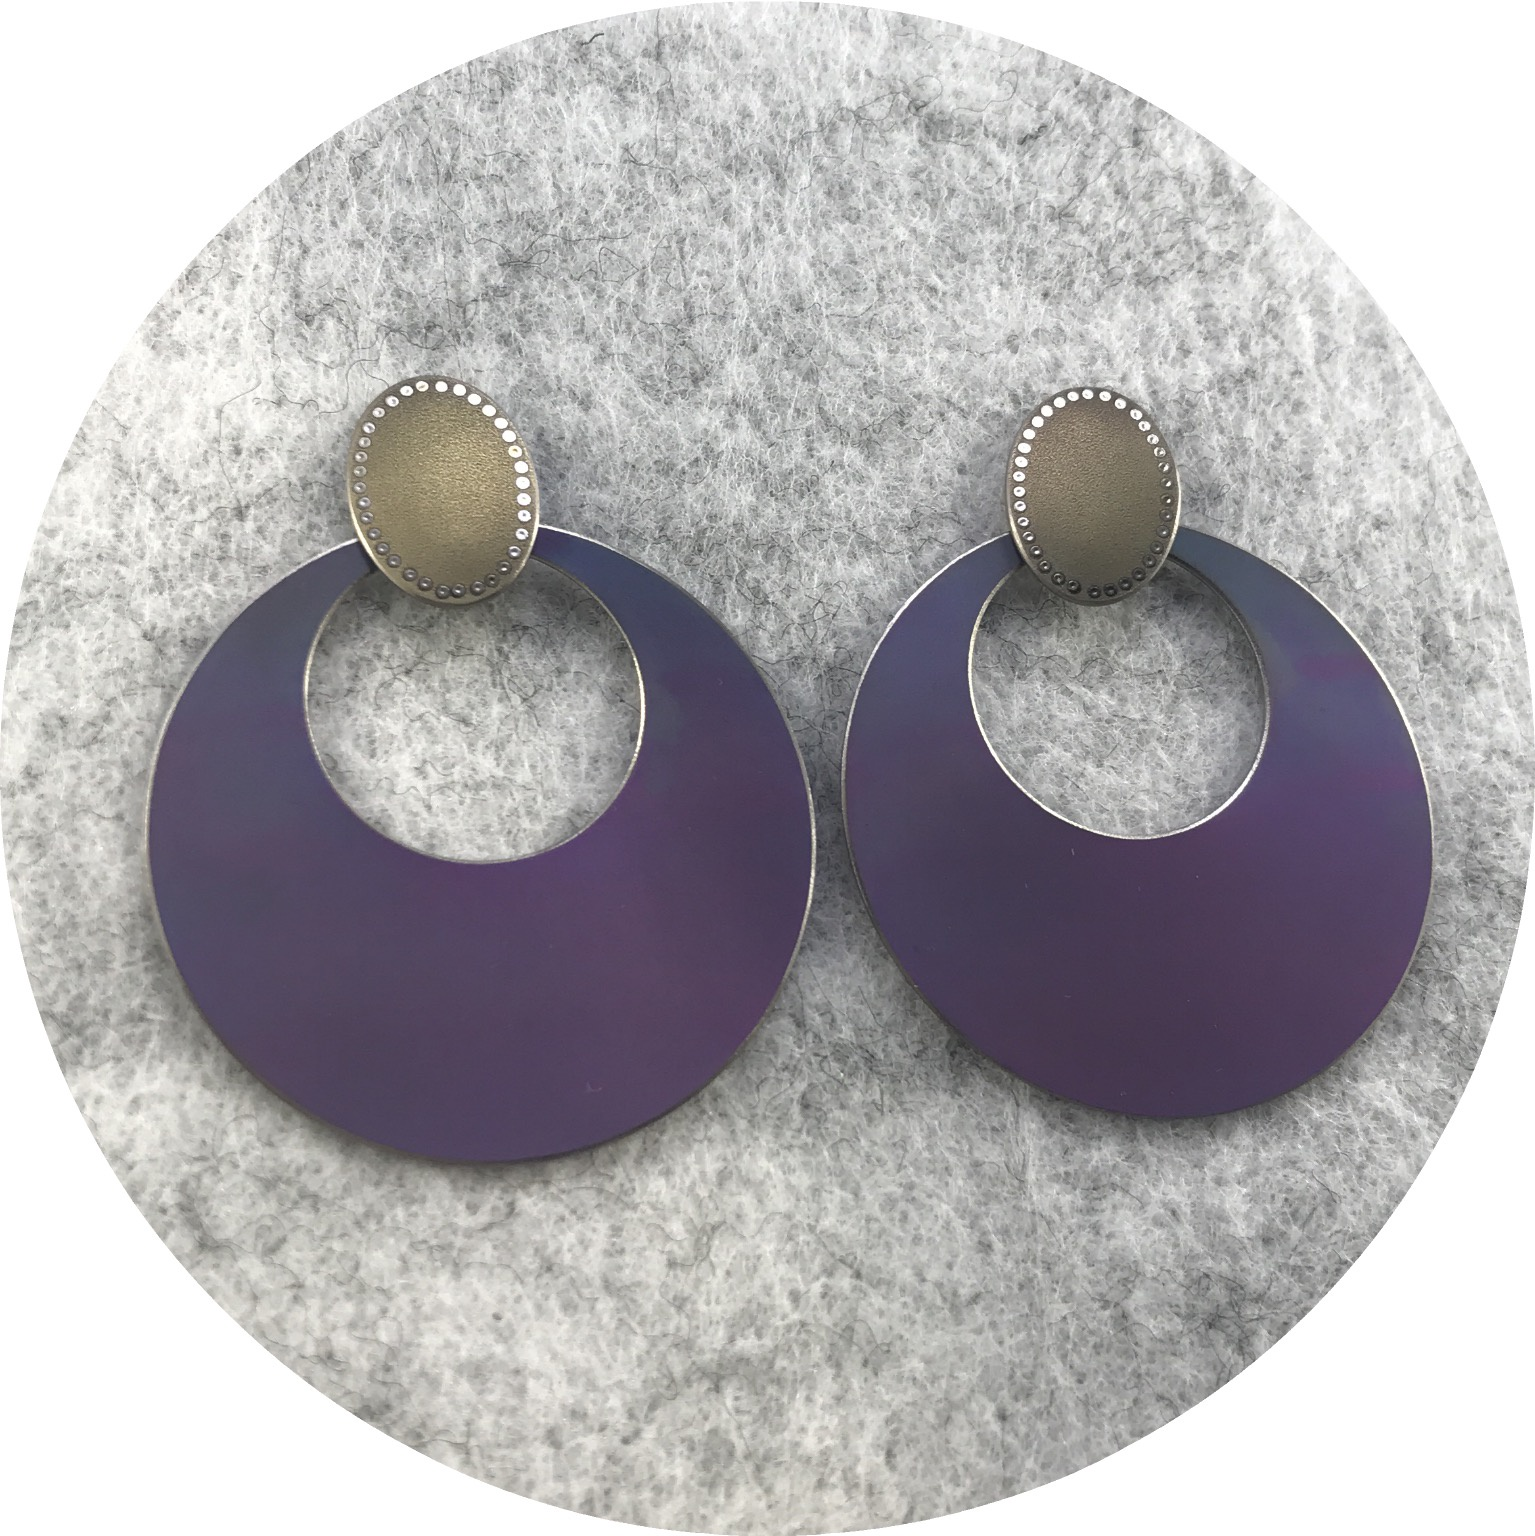 Sarah Murphy - Large Disc anodised titanium swingers in gold/purplepurple - 55mm x 40mm